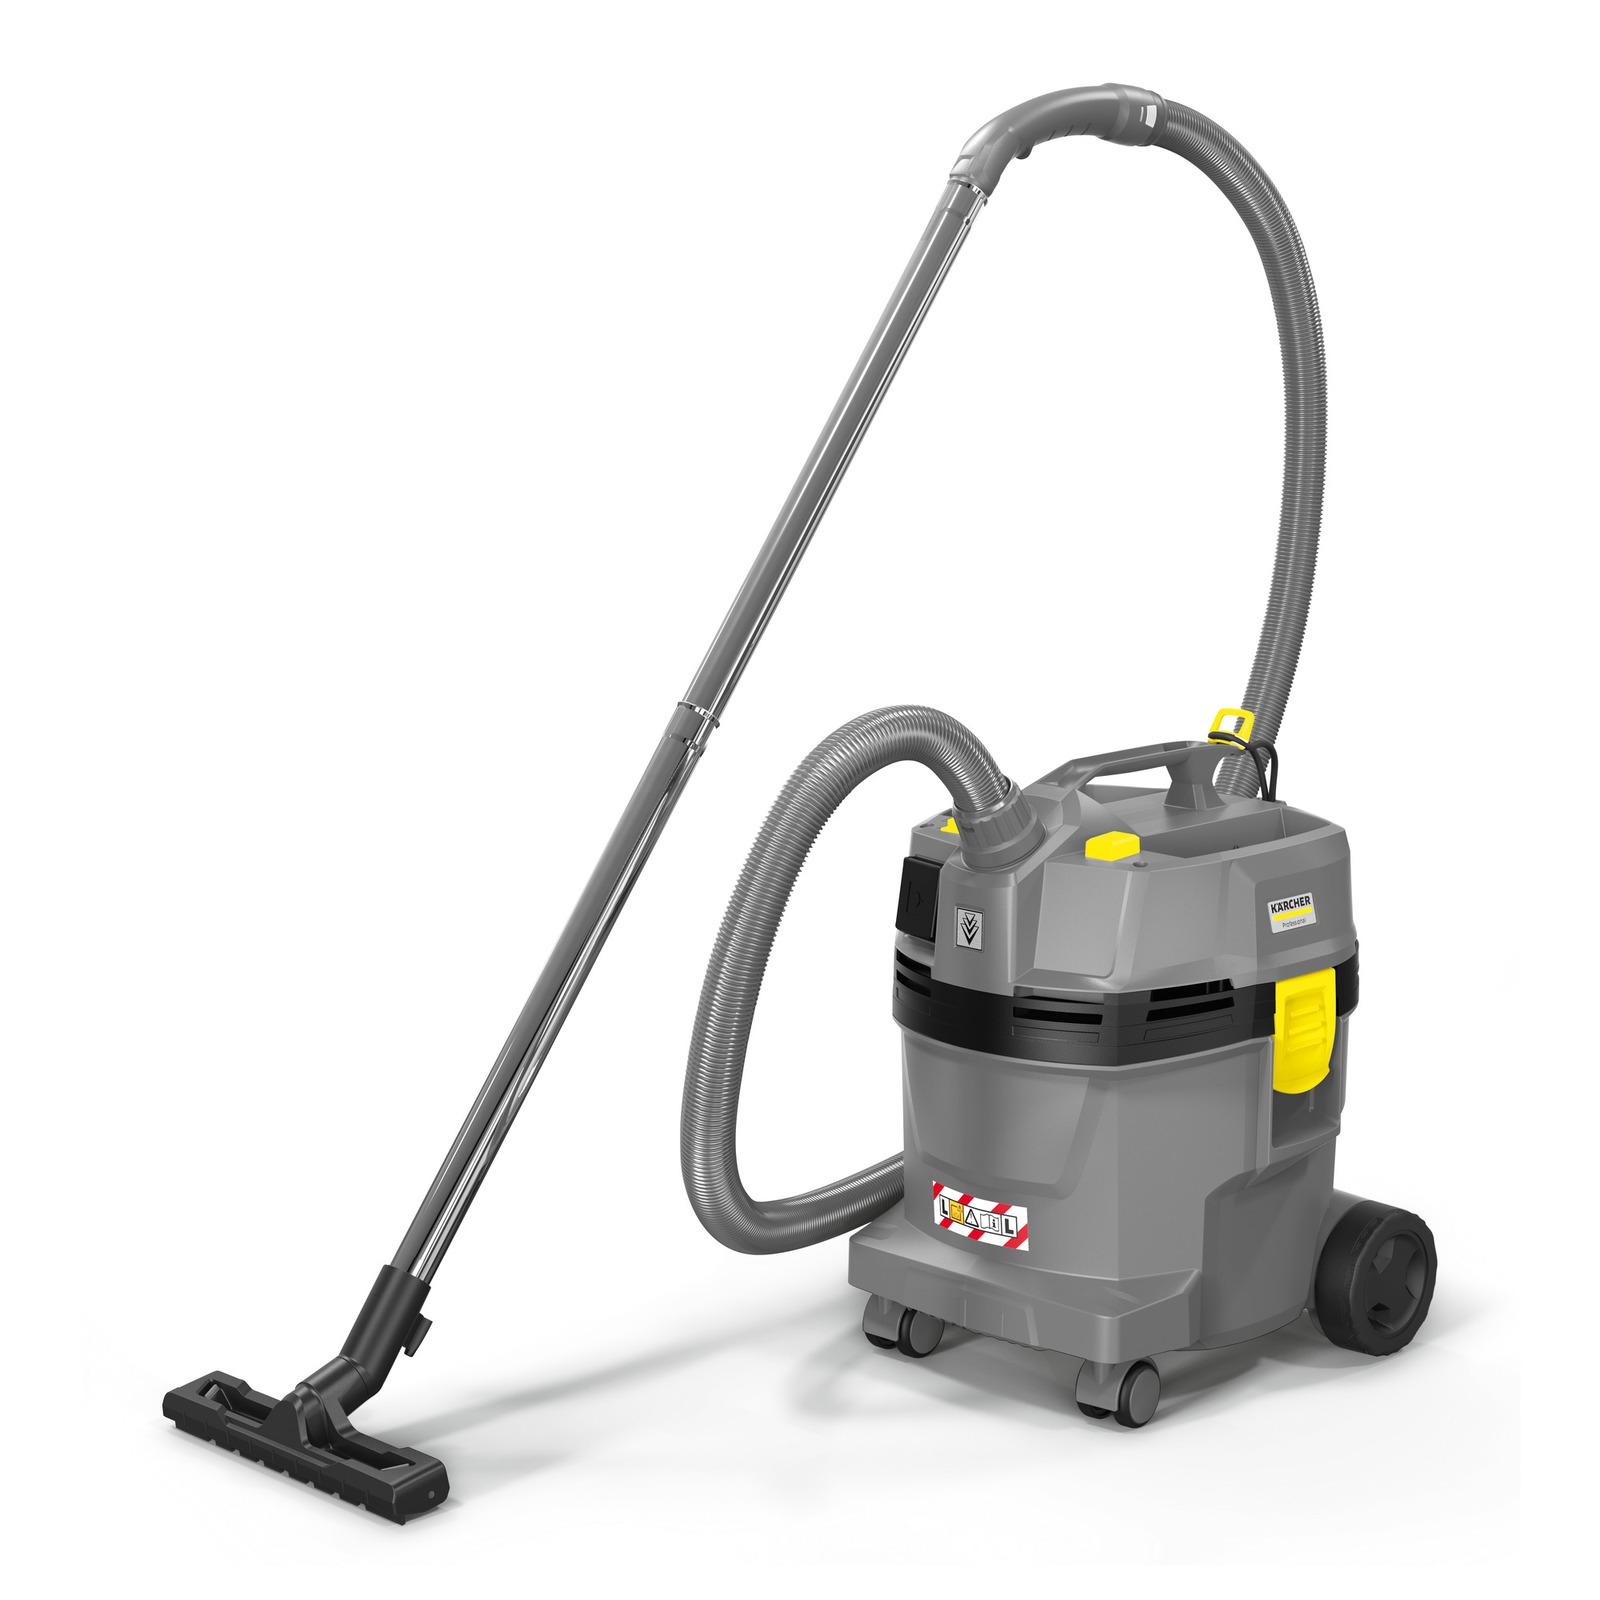 Wet And Dry Vacuum Cleaner Nt 22 1 Ap Te Gb 240v